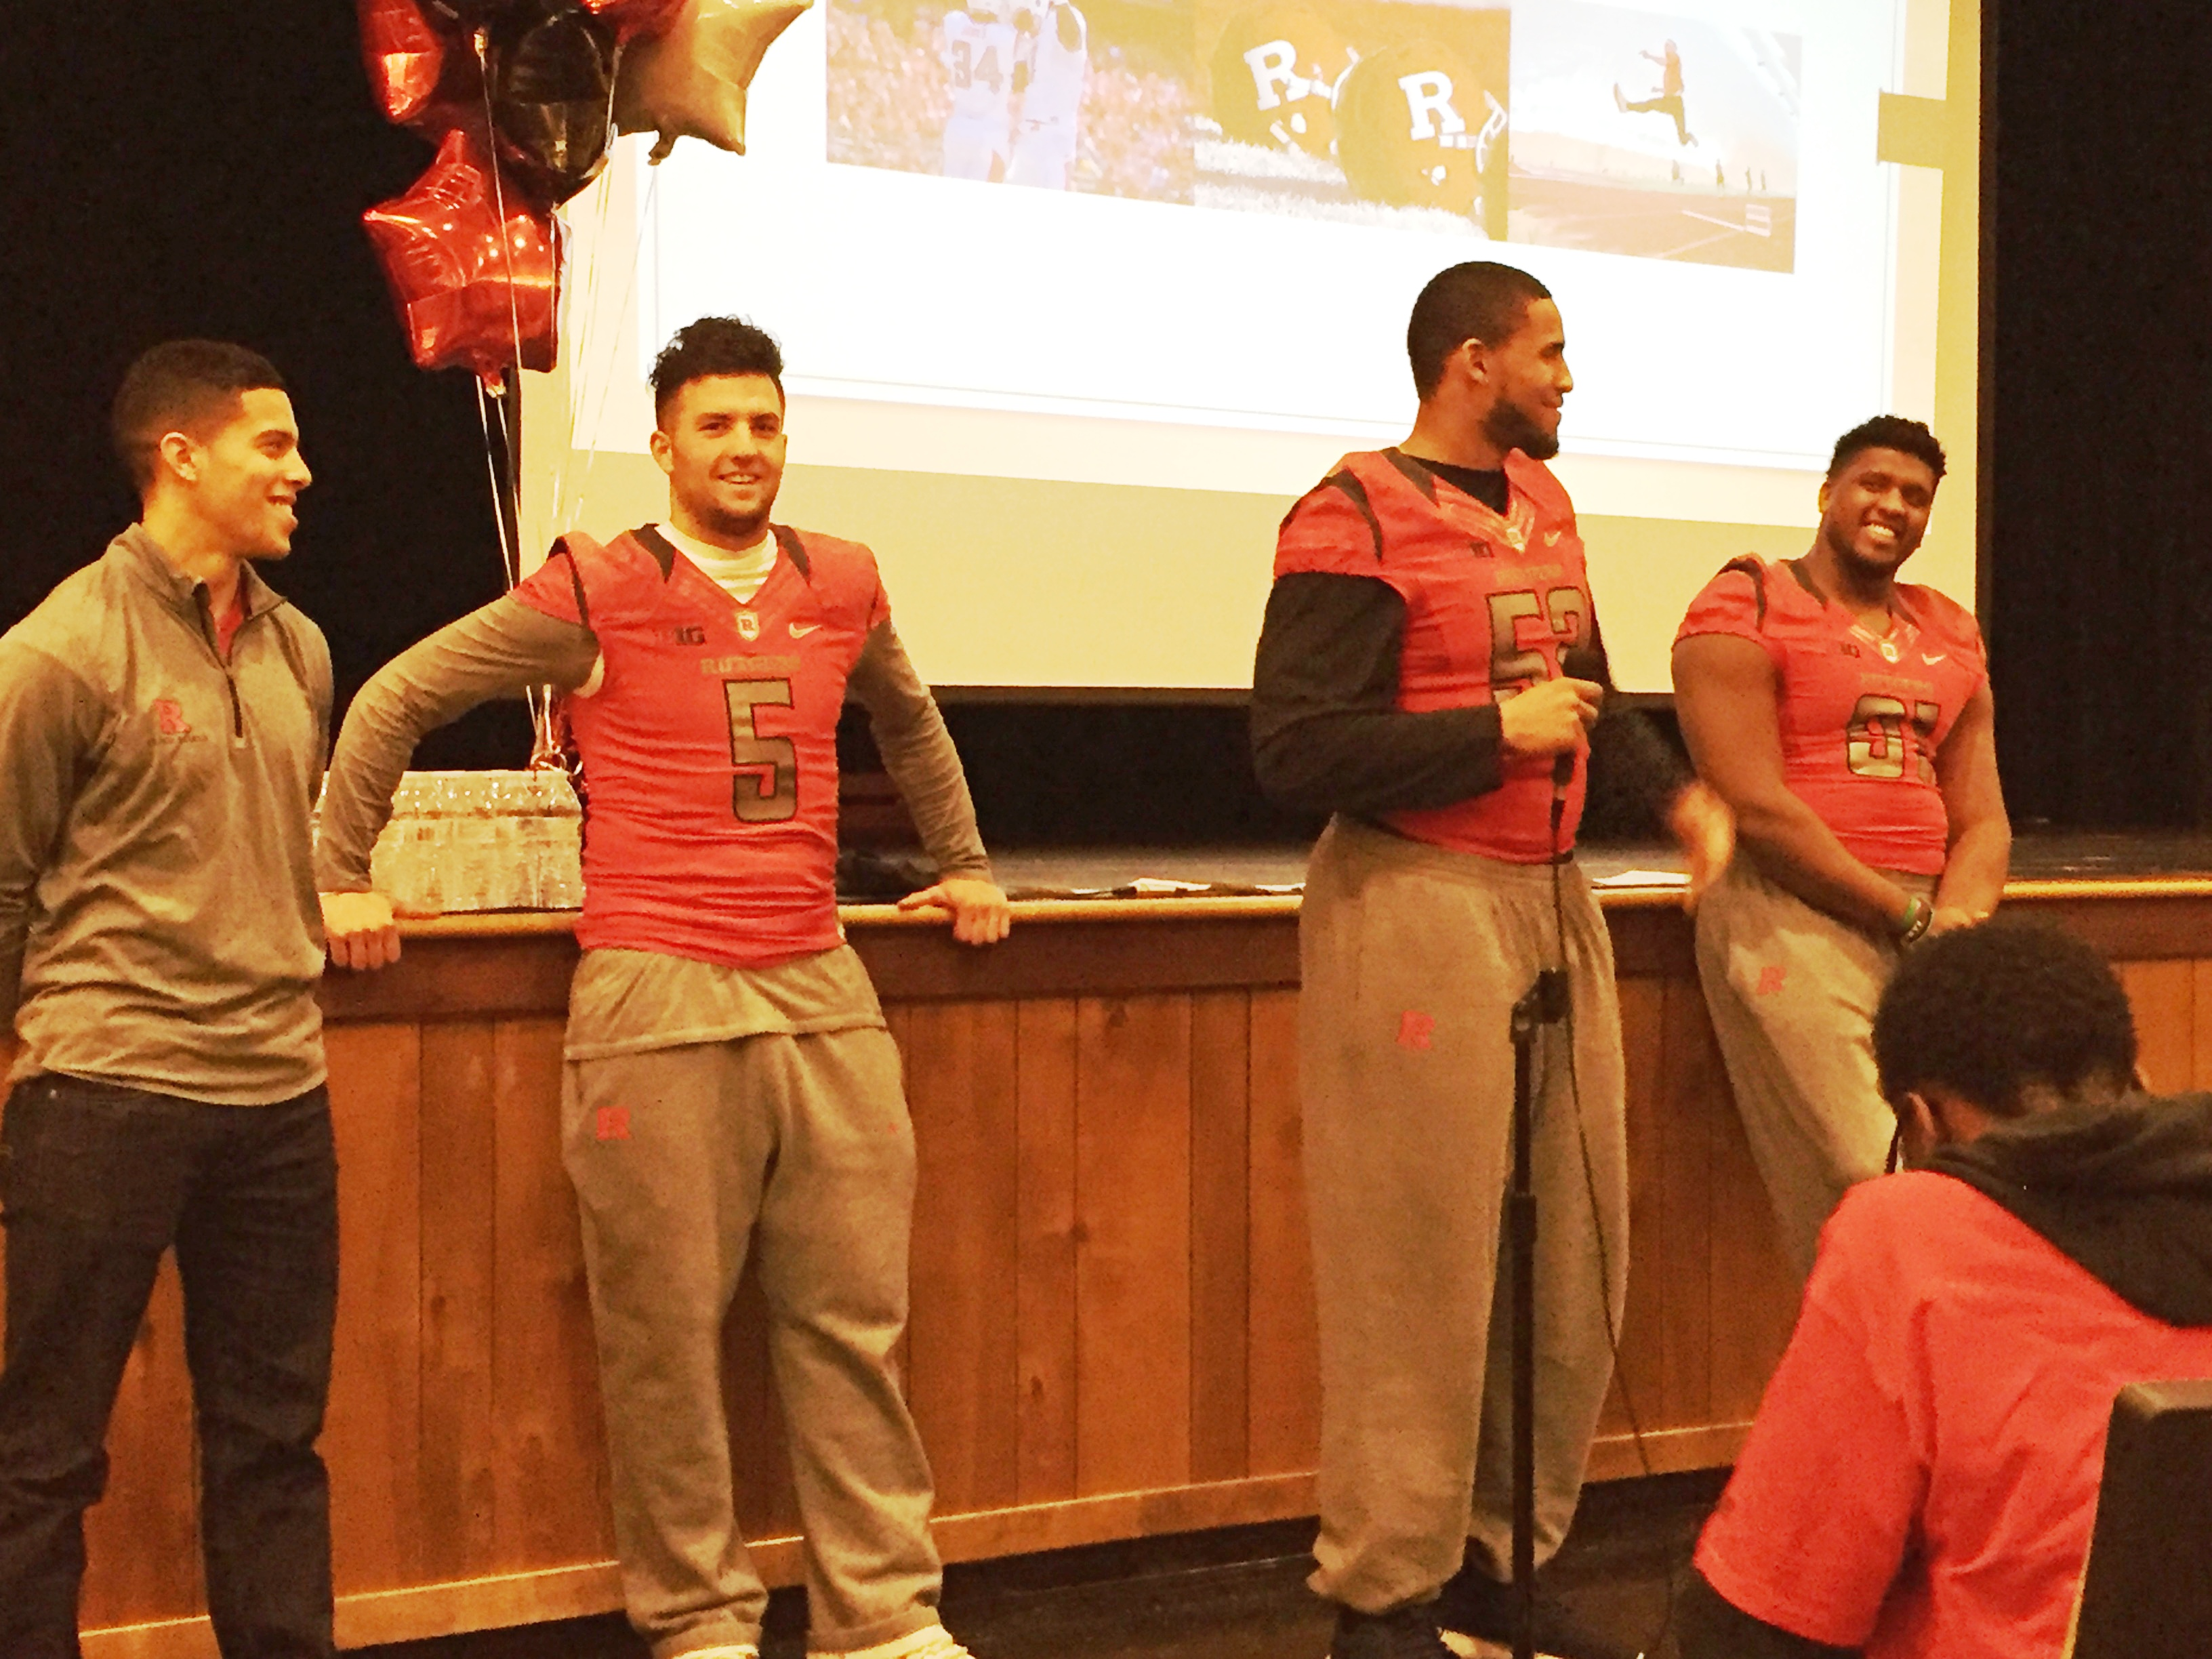 411beb40feb23c368788_Schor_MS_Rutgers_Football_Assembly_050.JPG